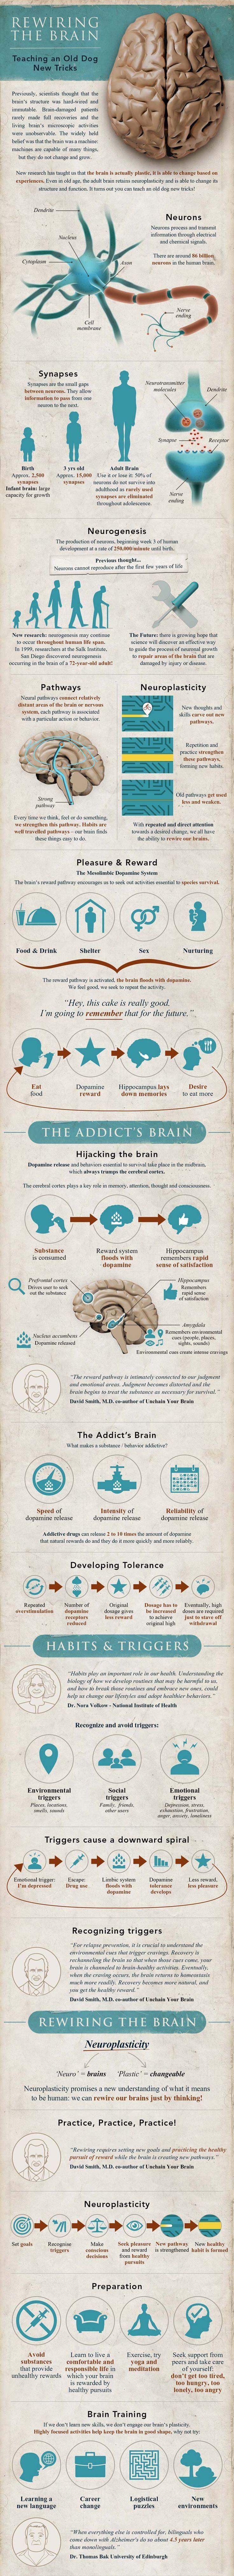 Neuroplastisicity